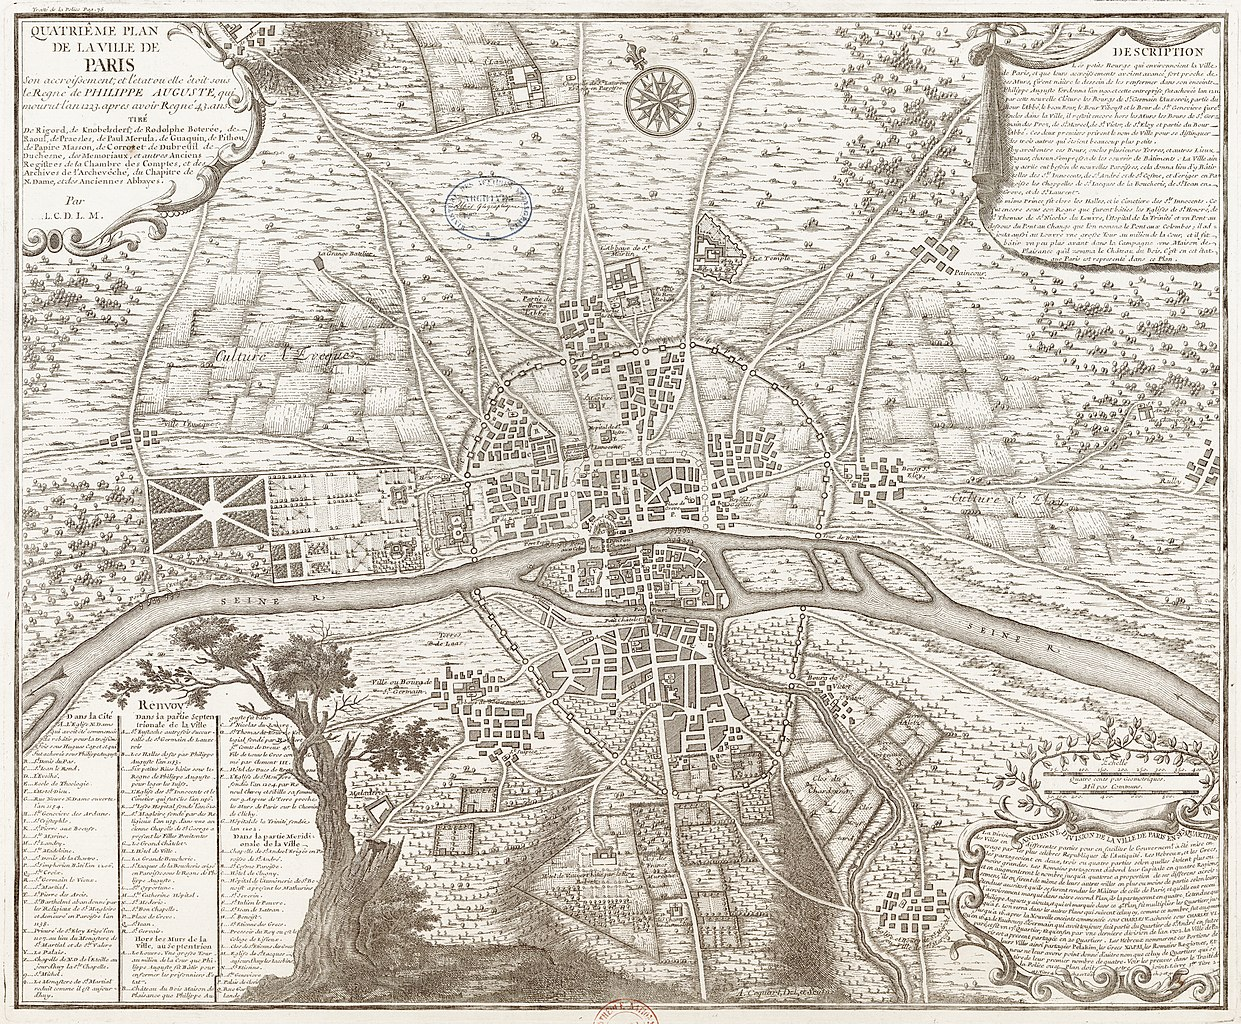 File:Plan de Paris 1223 BNF07710747 - Gallica.jpg